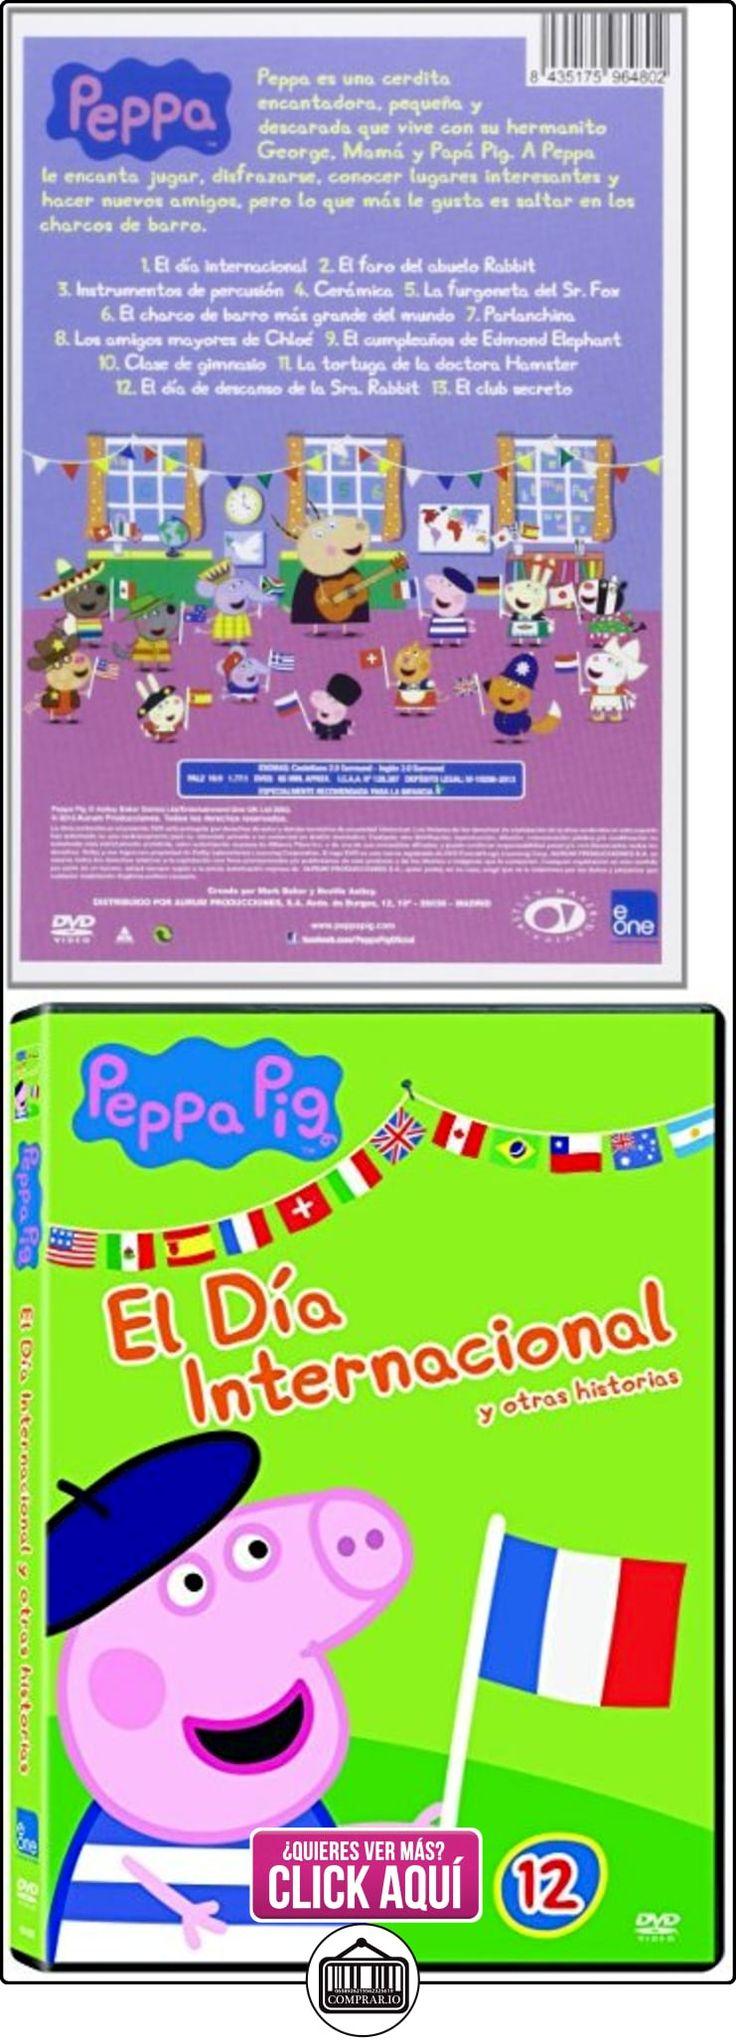 Peppa Pig - Volumen 12 [DVD]  ✿ Peppa Pig - Peppa La Cerdita ✿ ▬► Ver oferta: http://comprar.io/goto/B00HRWMQYW